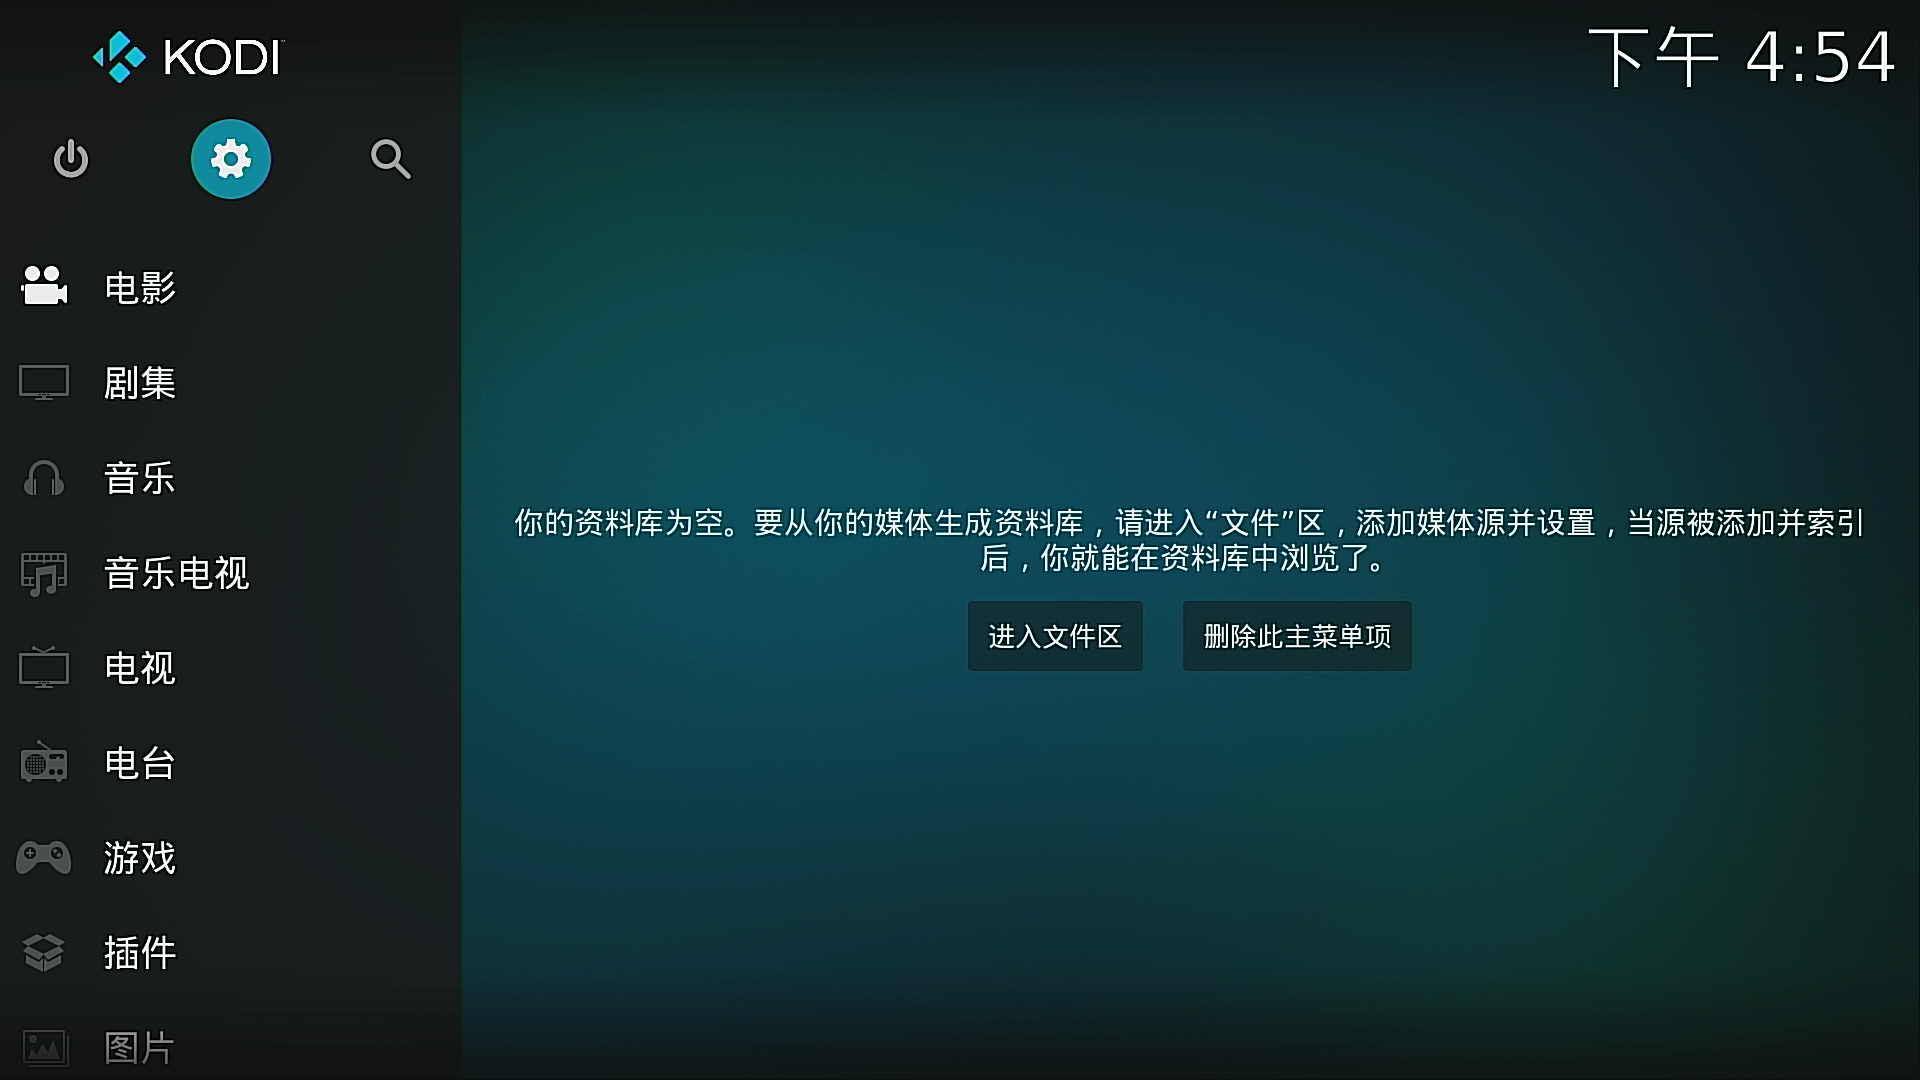 Screenshot 2021-07-22 16-54-33.png